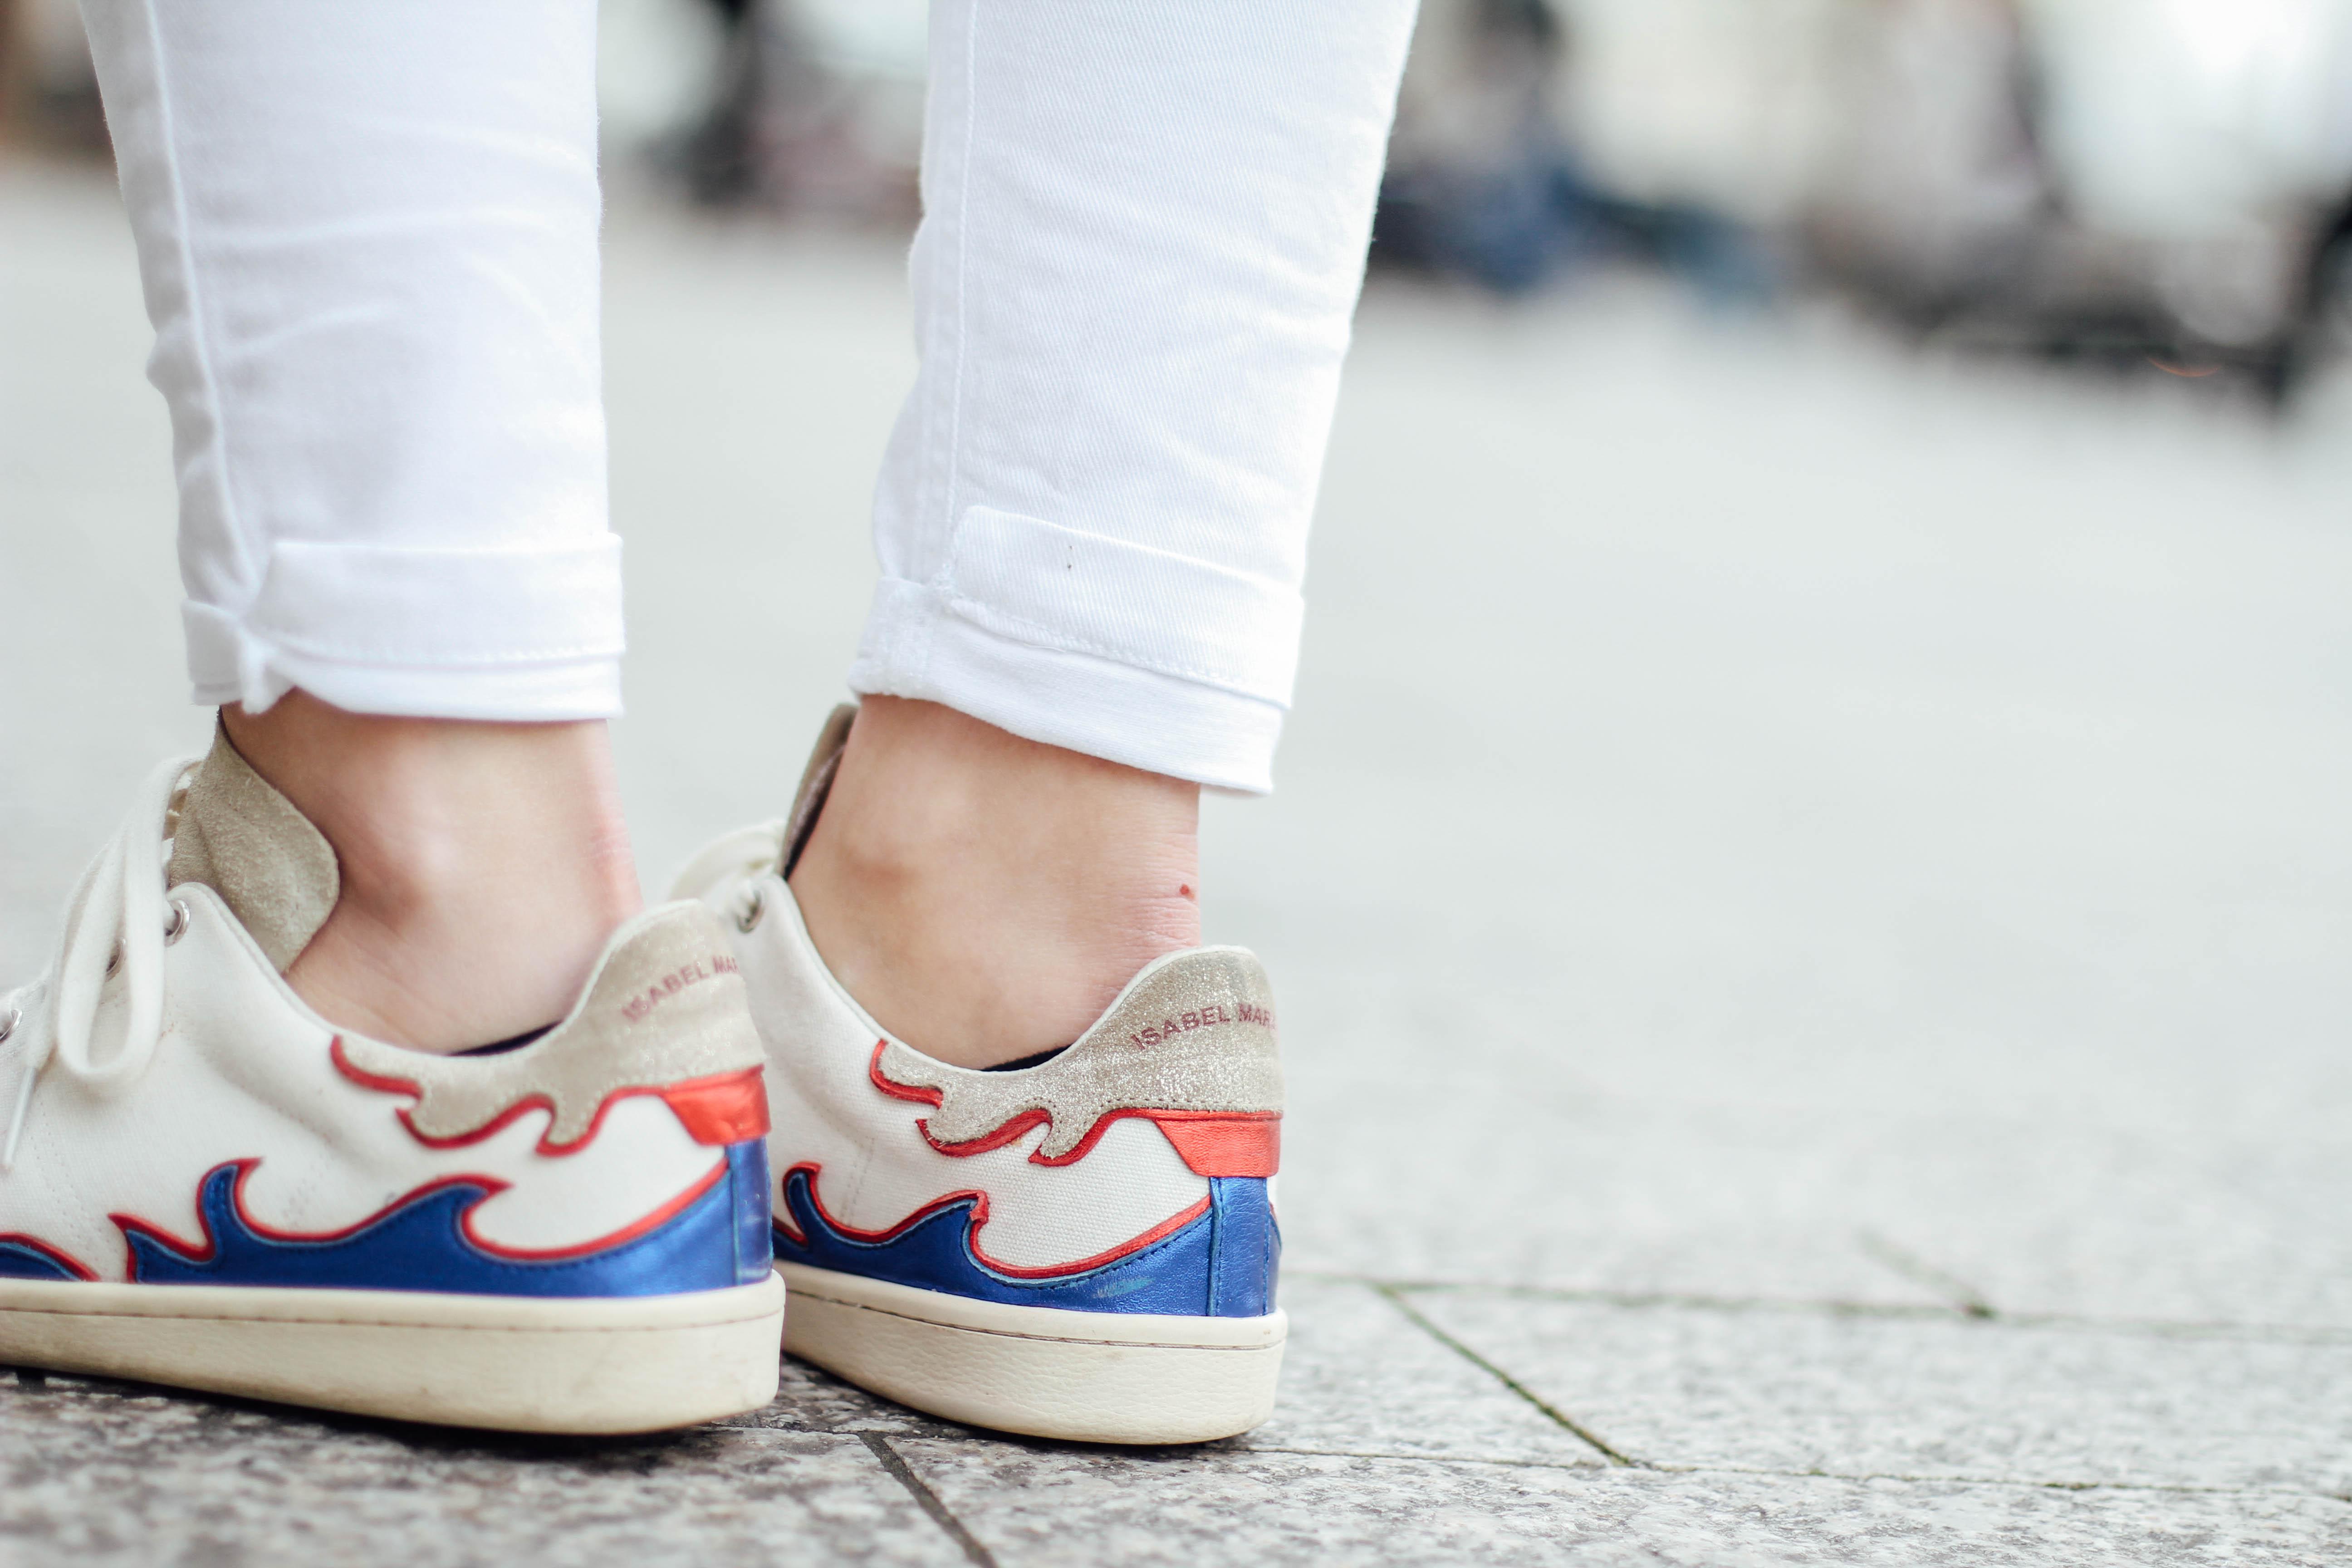 shearling-jacket-beige-isabel-marant-sneakers-streetstyle bart etoile